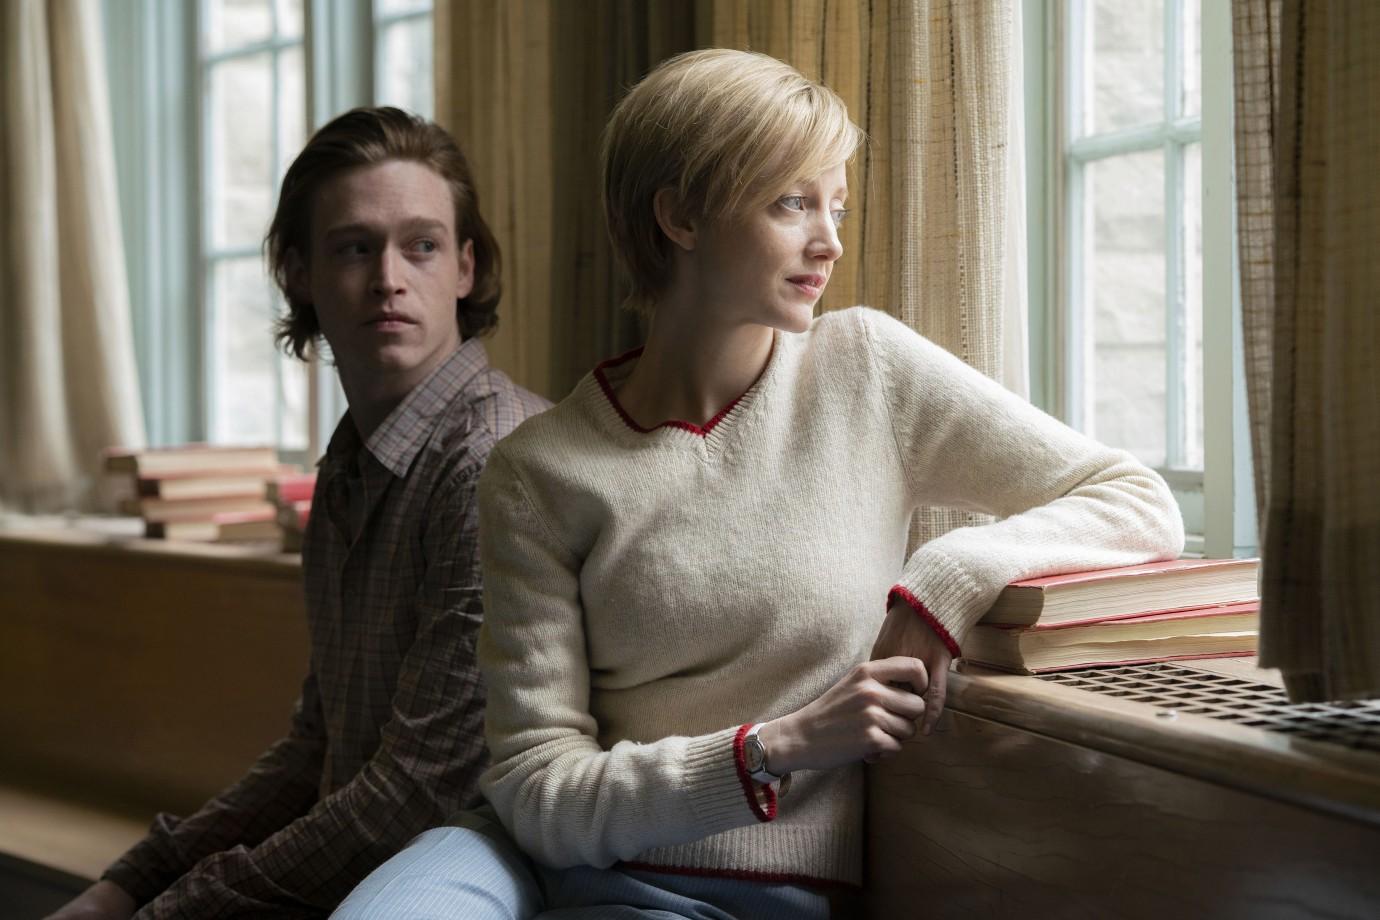 The Kindness of Strangers: Andrea Riseborough, Caleb Landry Jones in una scena